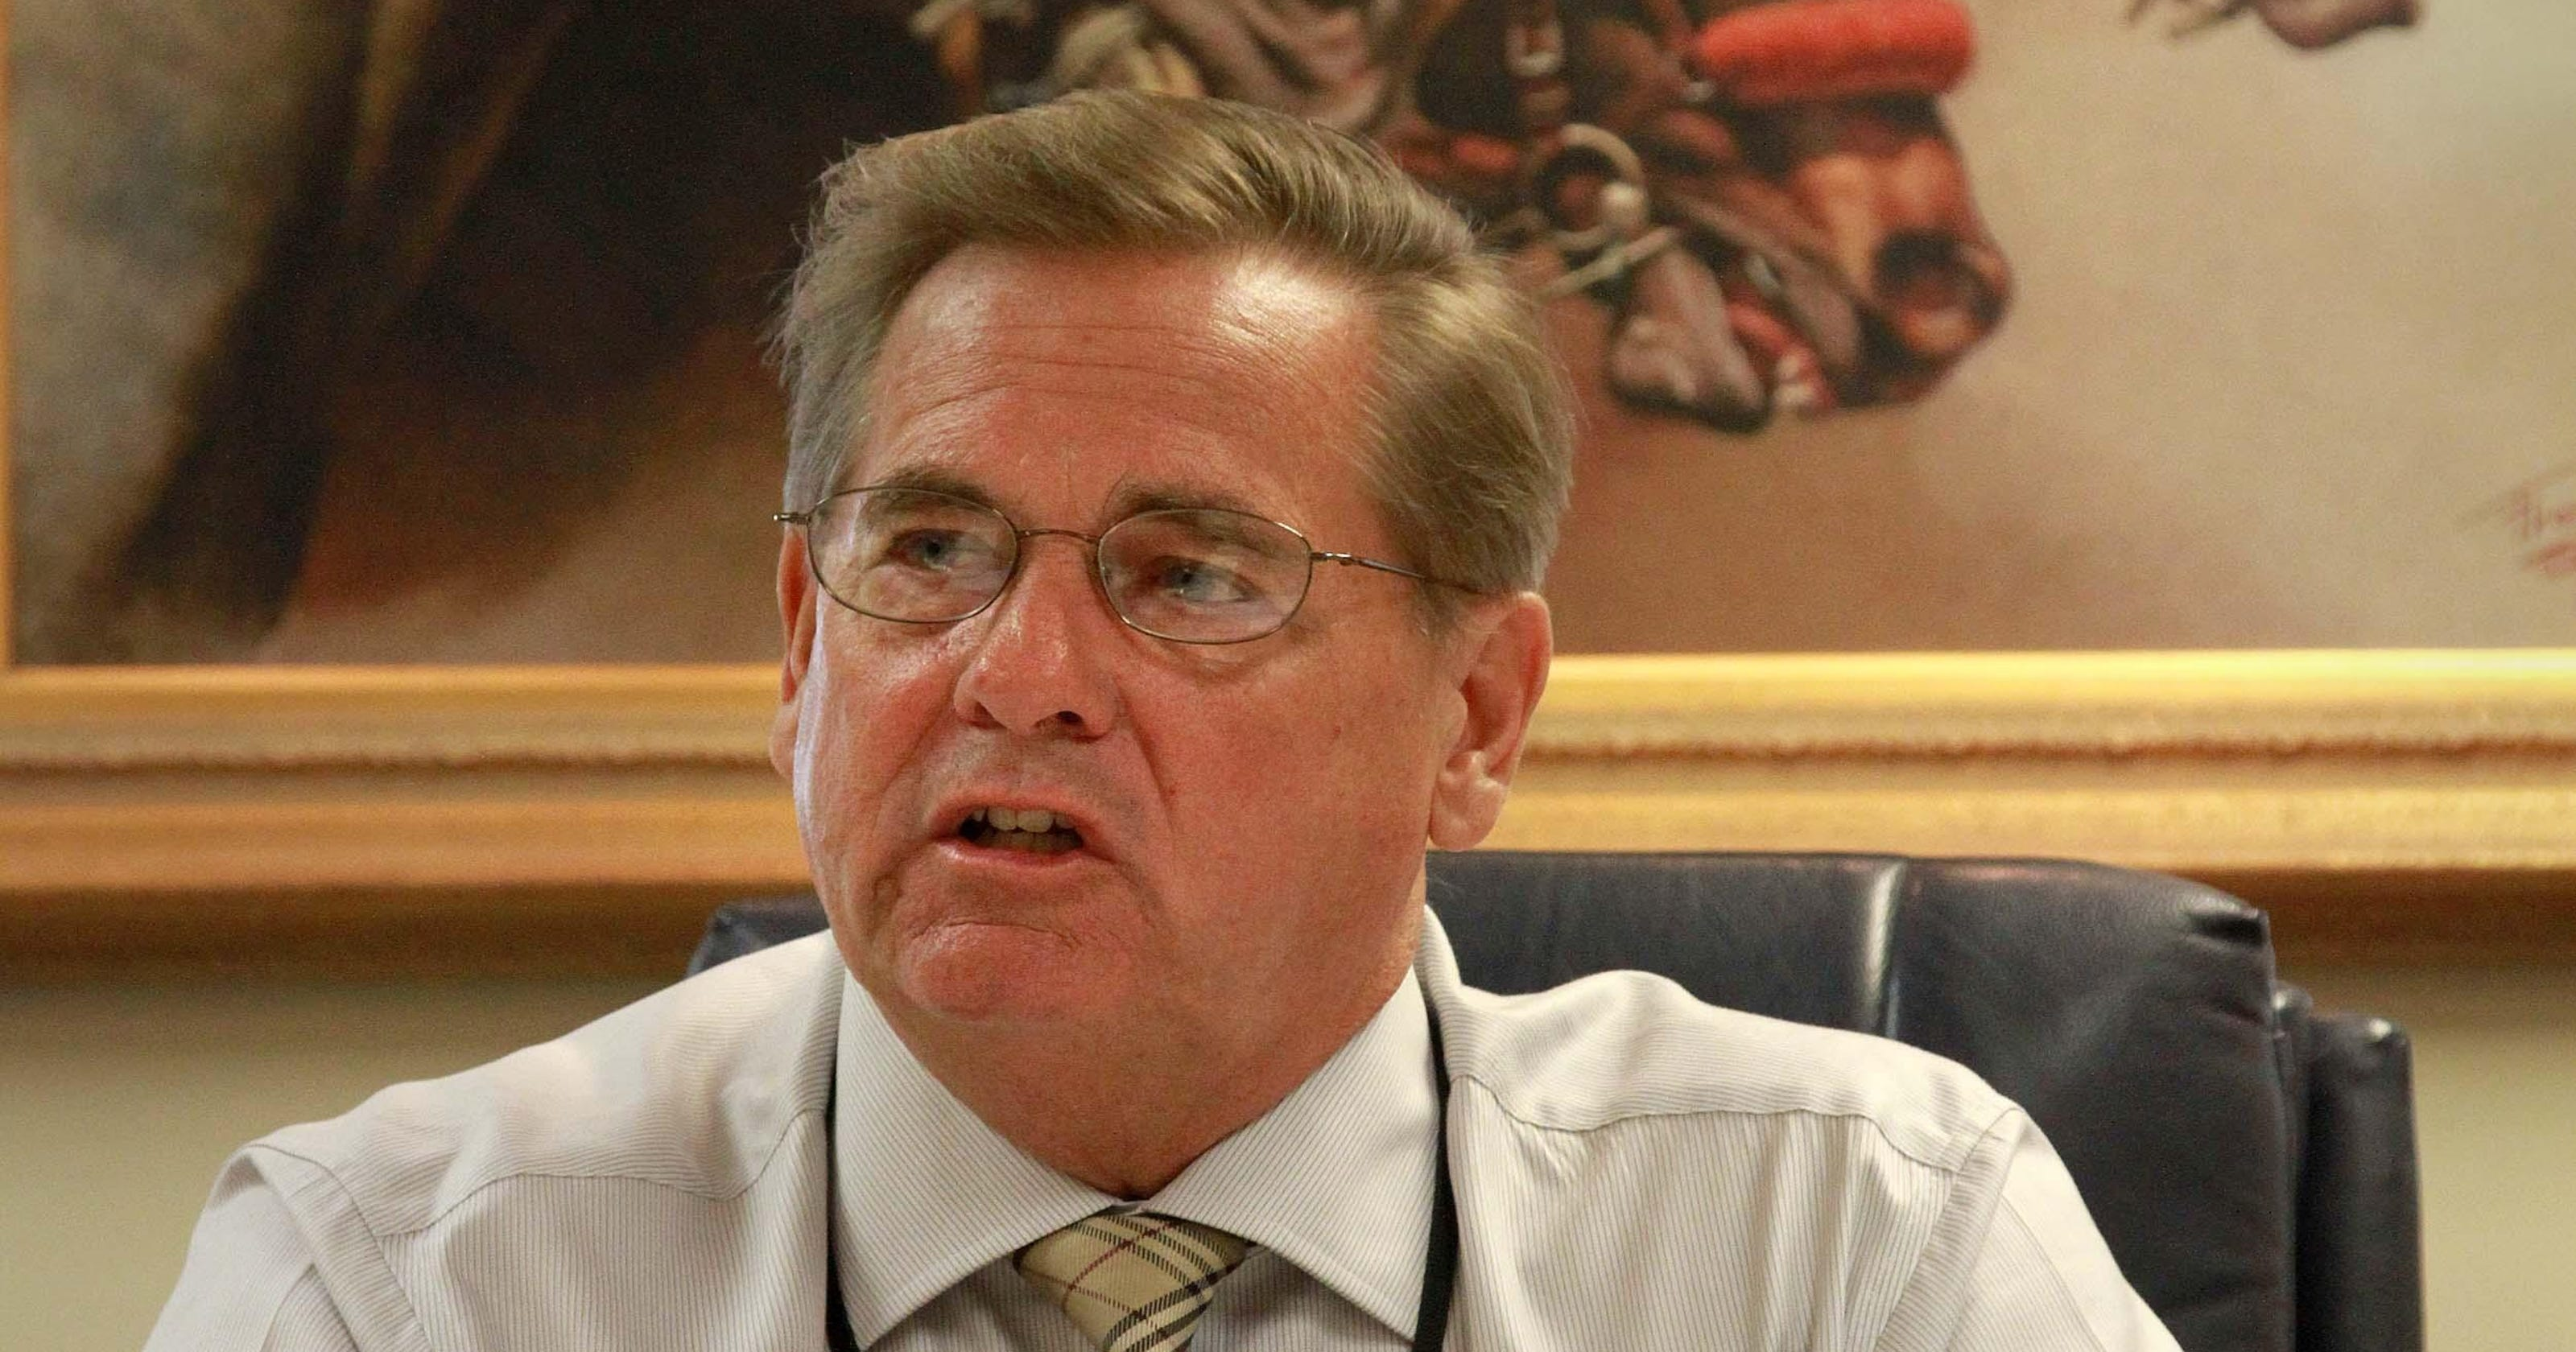 Prairie Meadows CEO takes home $200k bonus